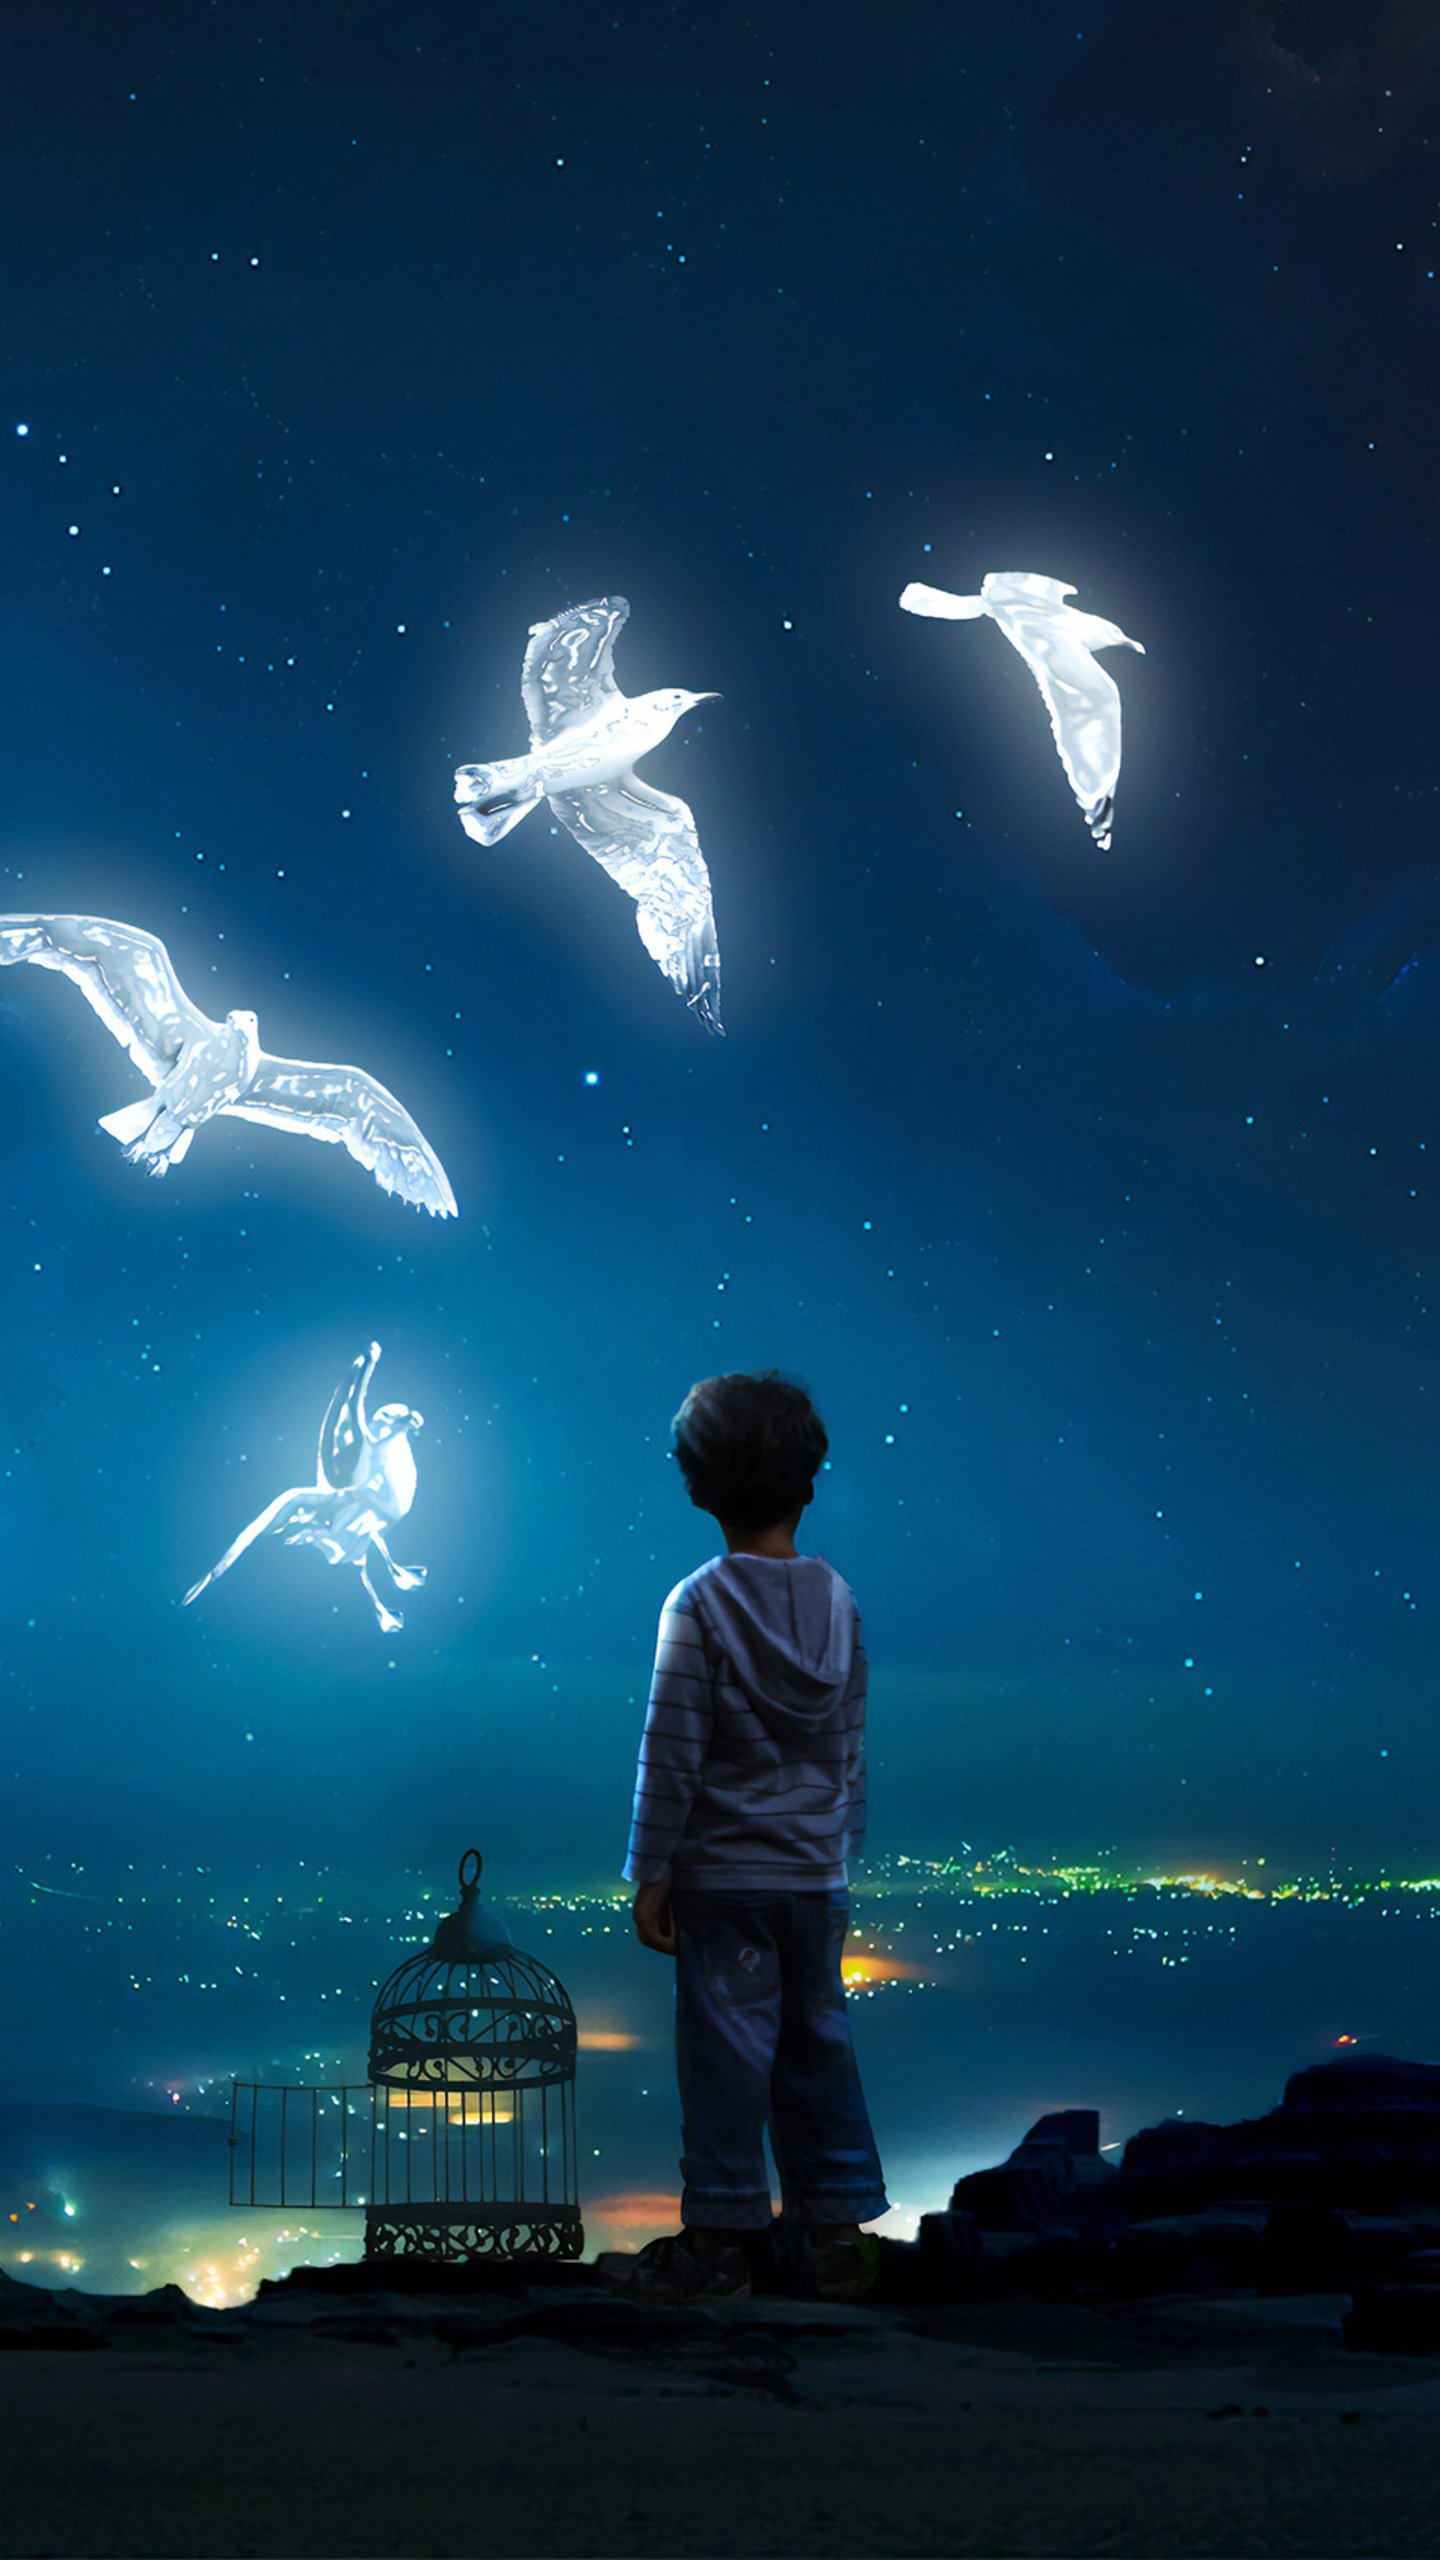 boy-child-freeing-birds-5b.jpg